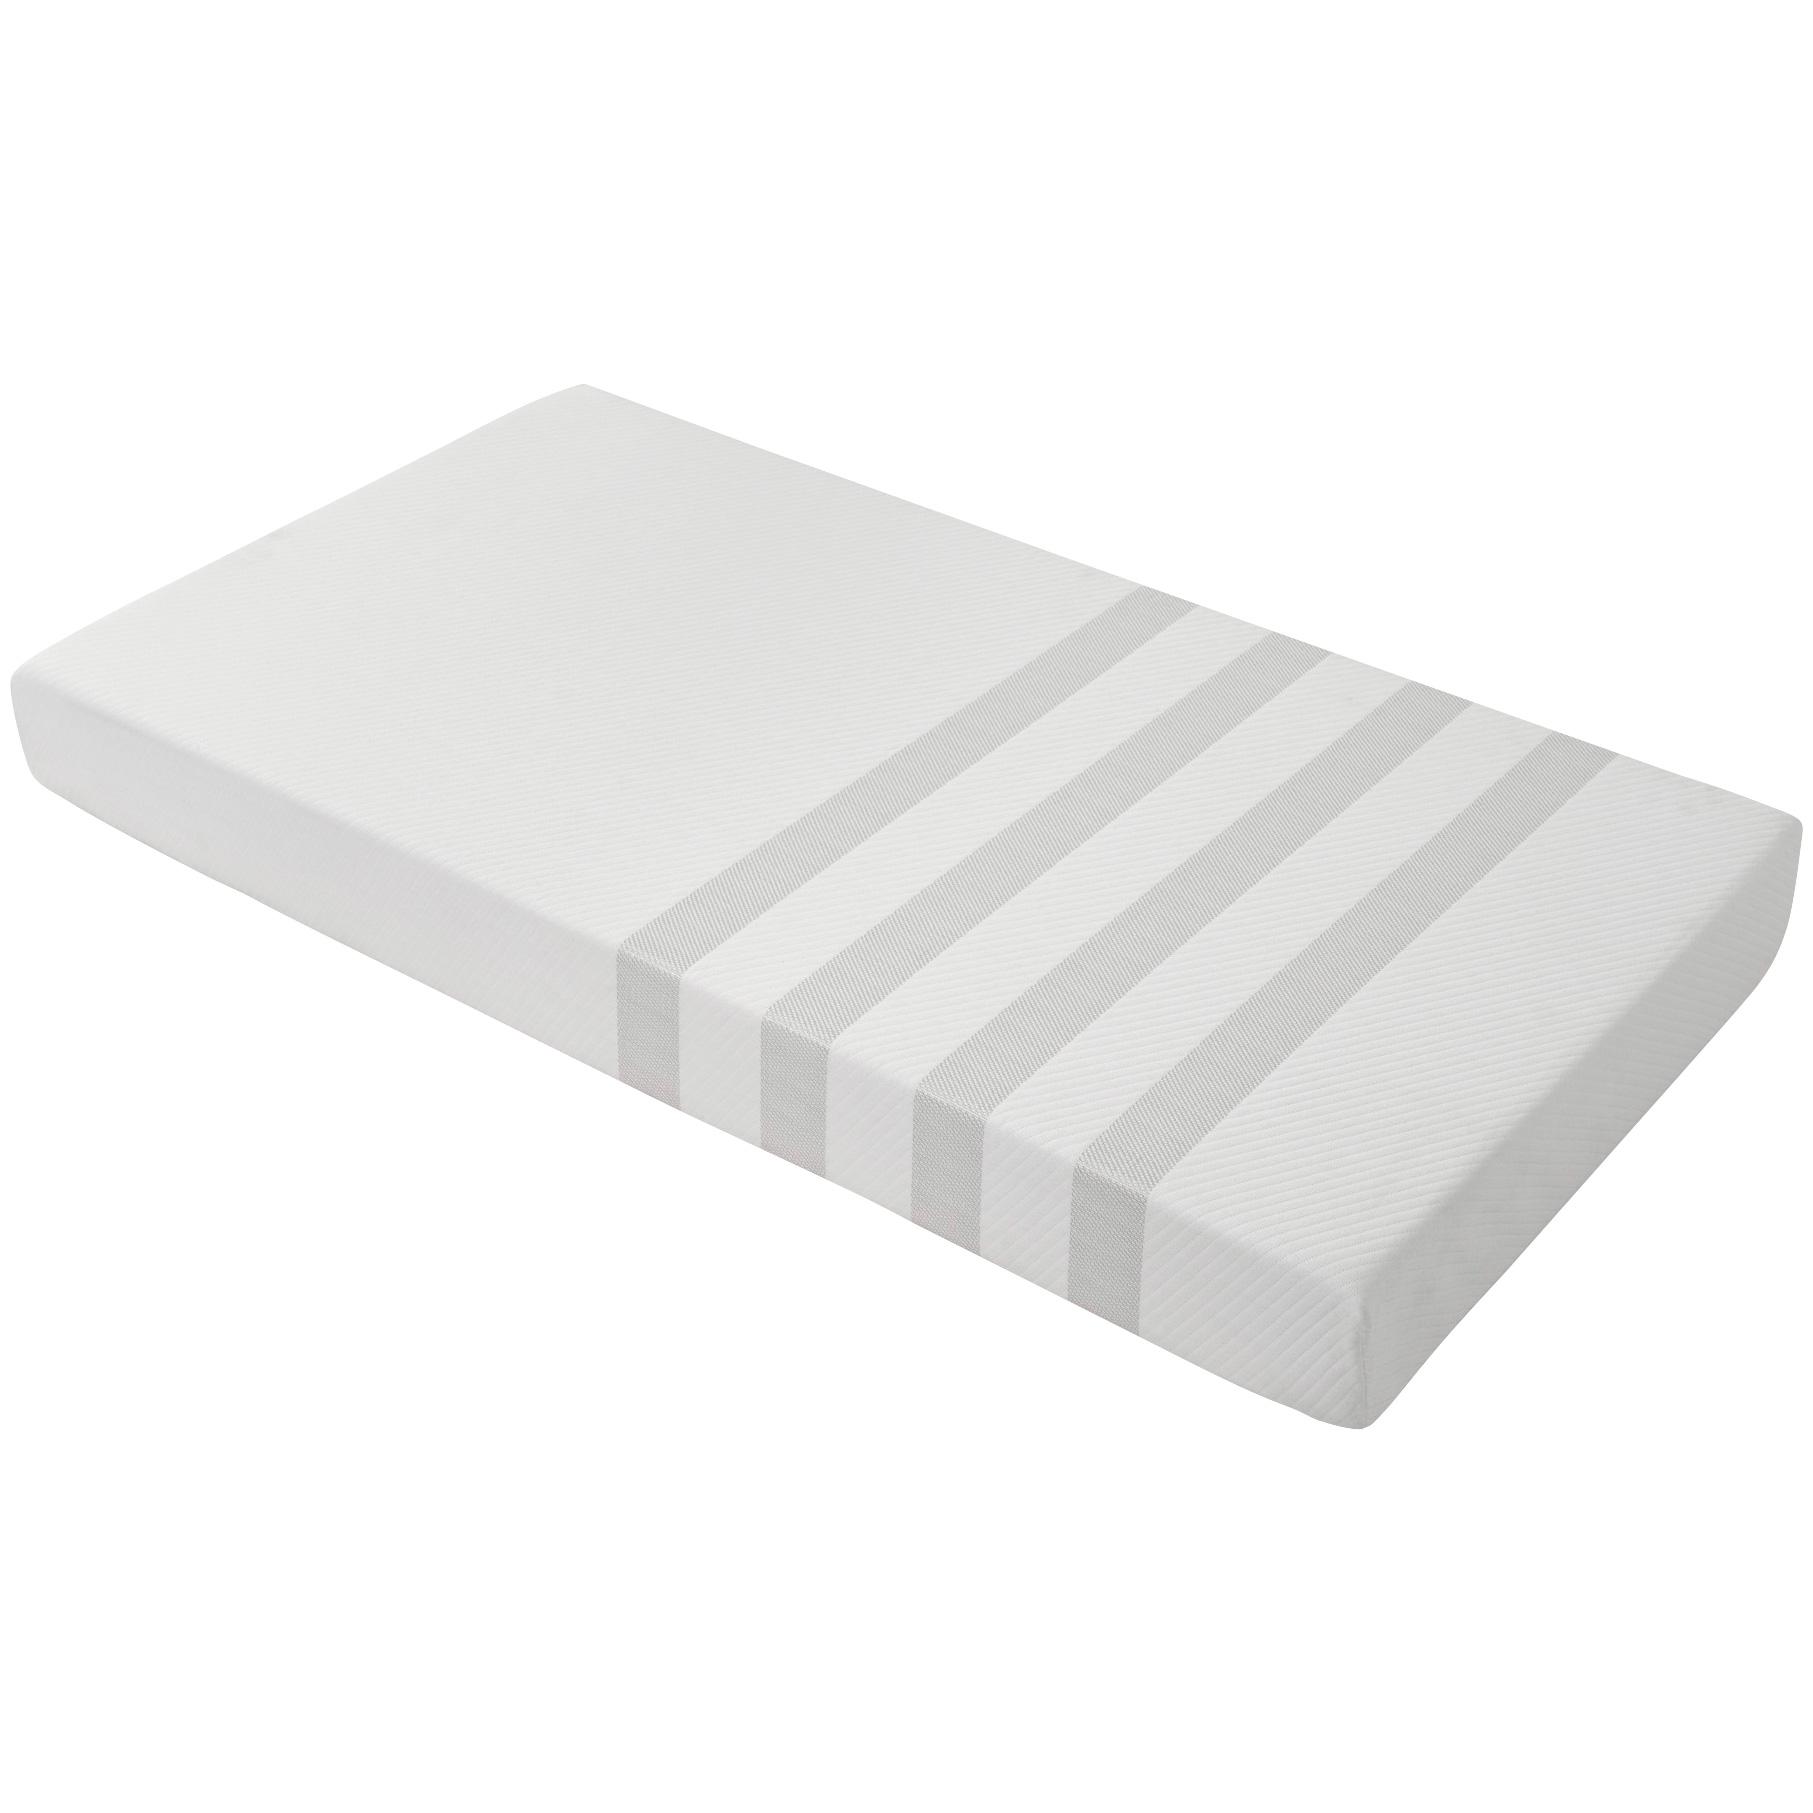 Westwood Design | Imagio Baby White Crib Mattress